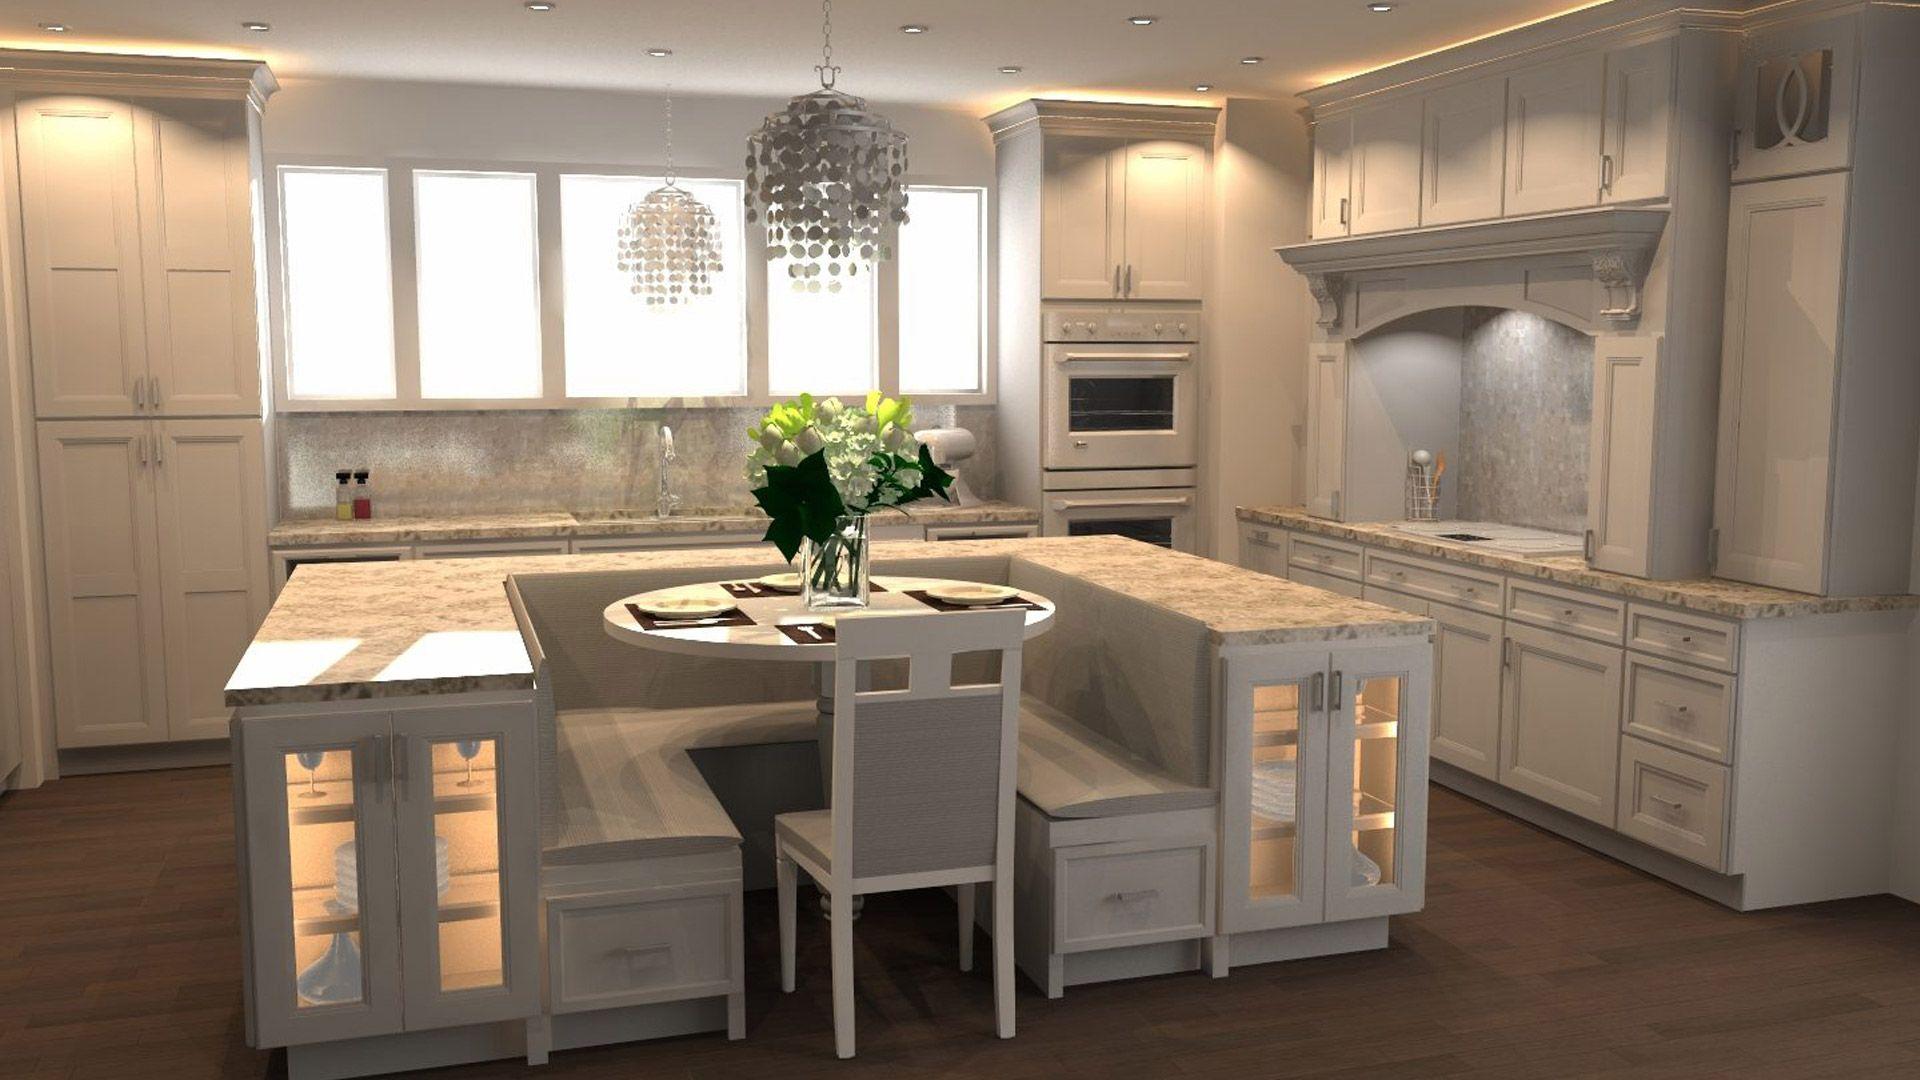 Download Wallpaper Best Kitchen Remodel Ideas 2020